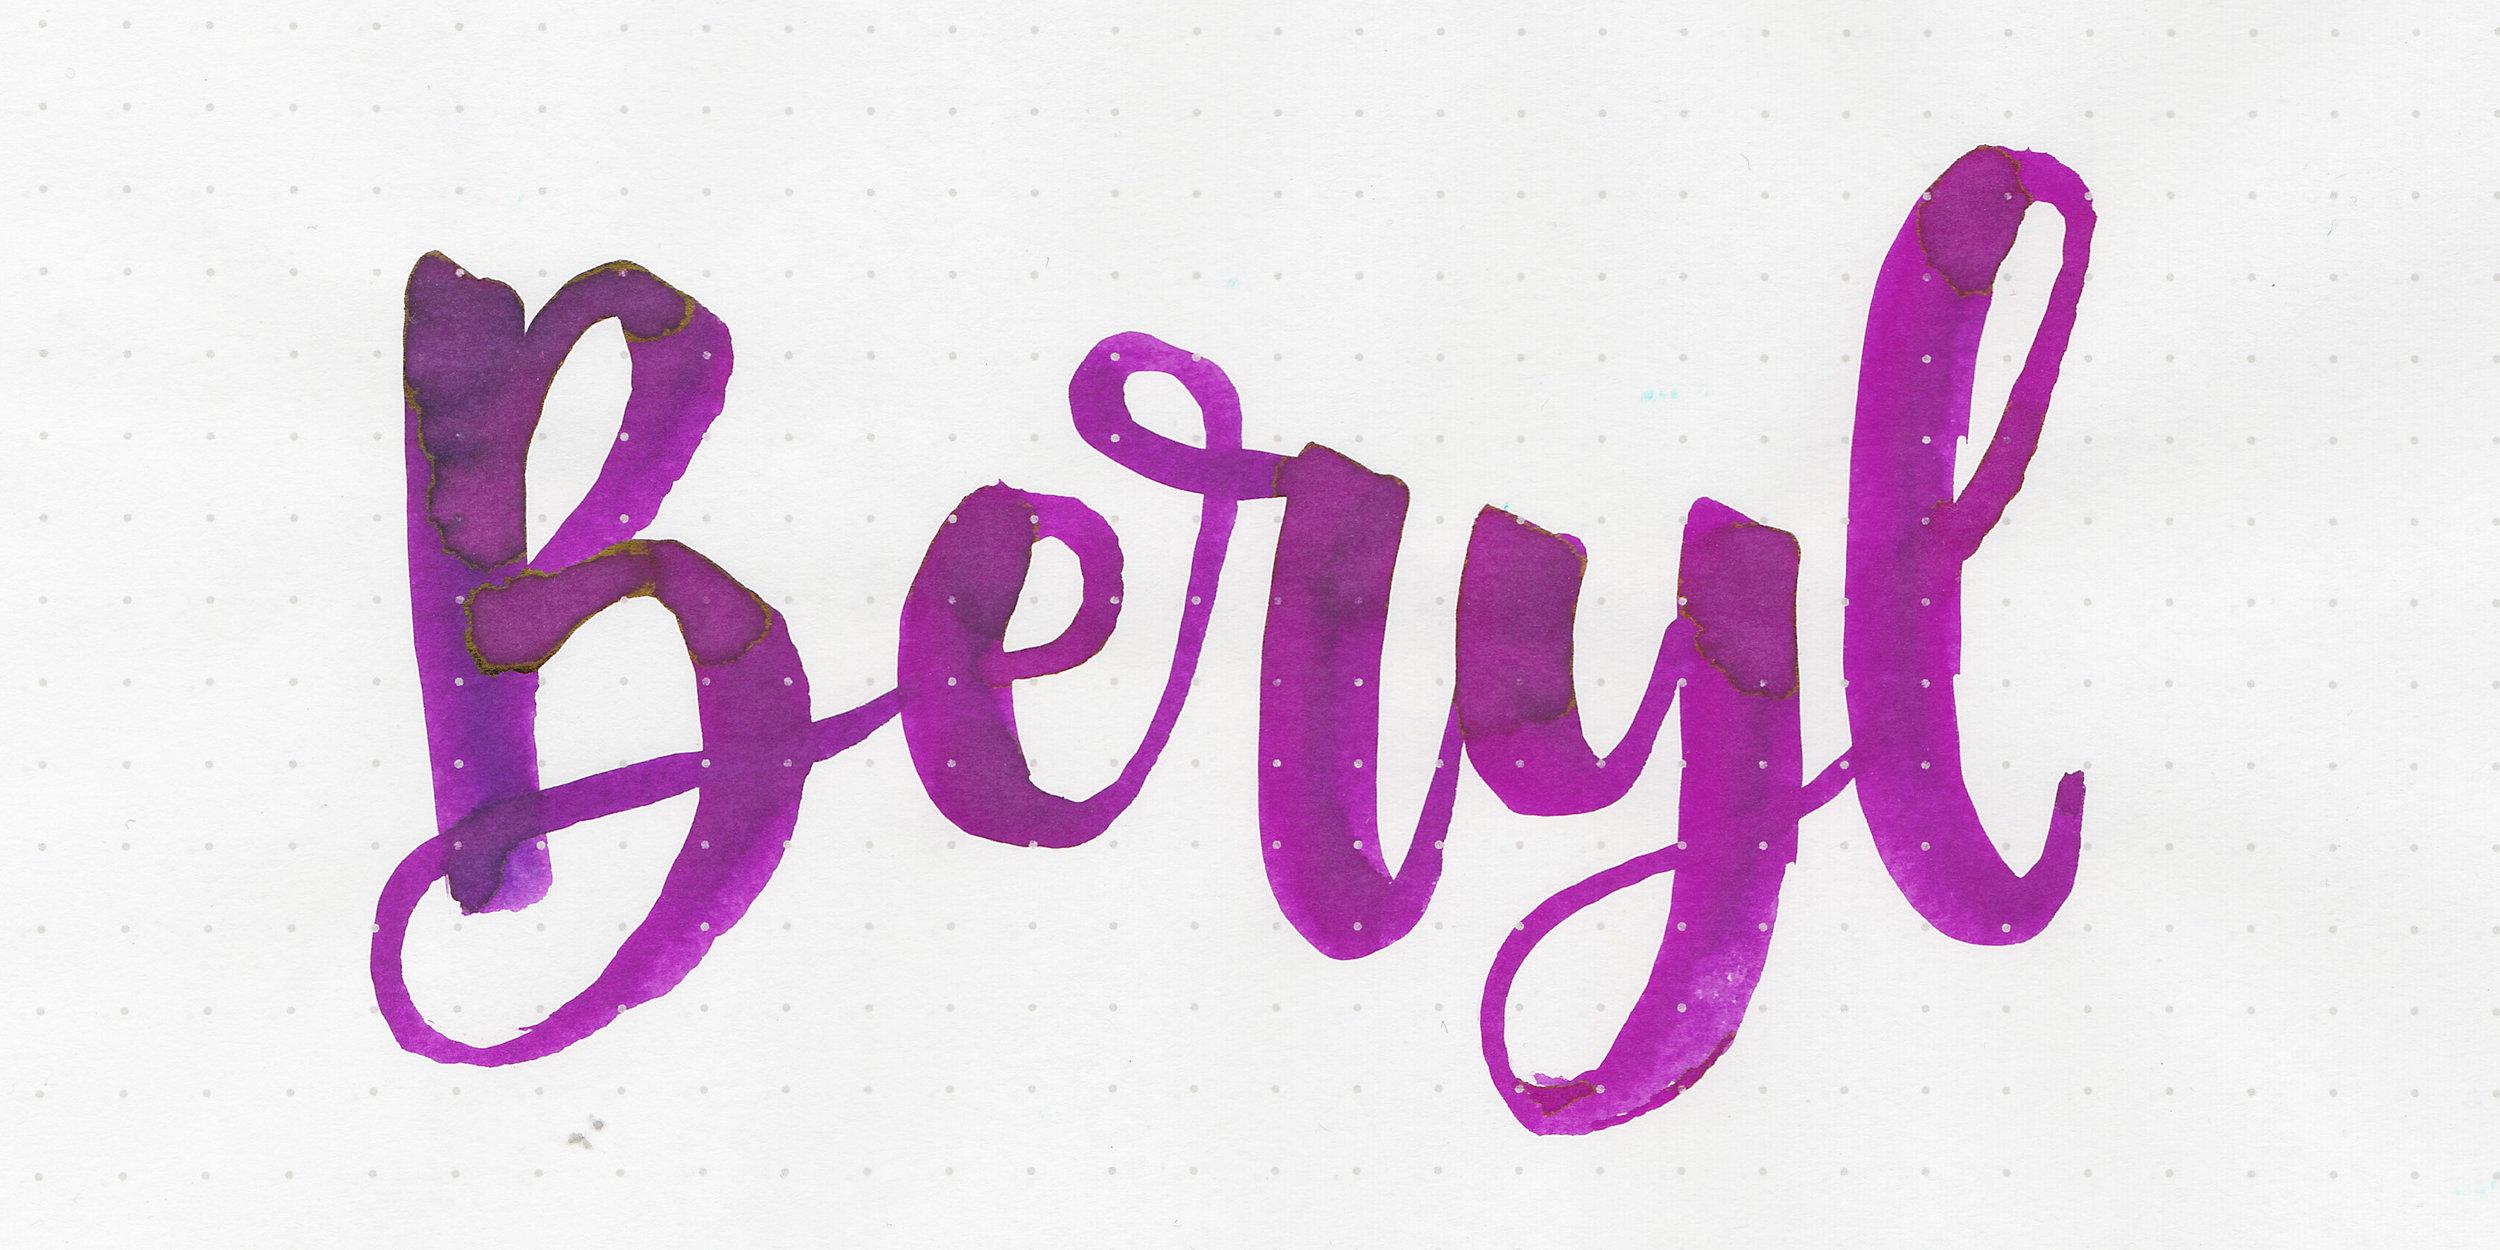 lmy-beryl-2.jpg